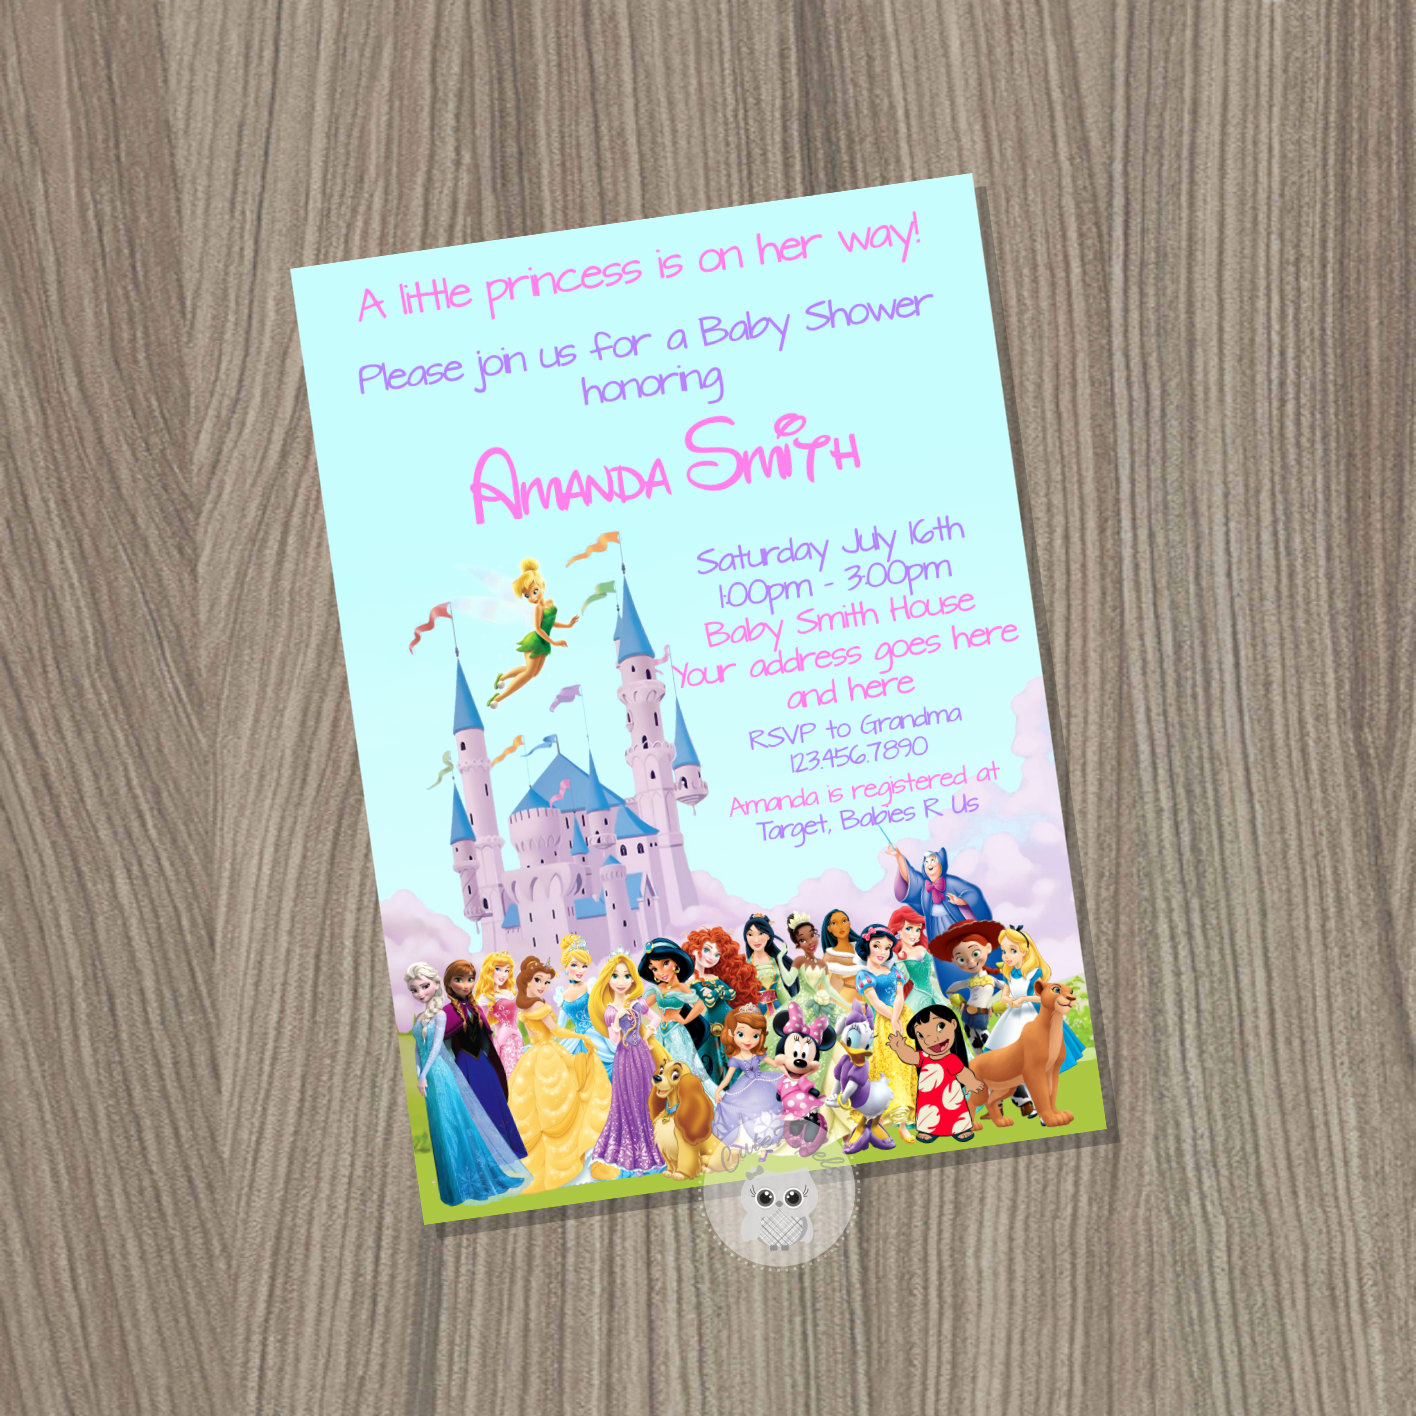 Disney Baby Shower Invitations New Baby Shower Invitation for Girl Disney Baby Shower Baby Girl